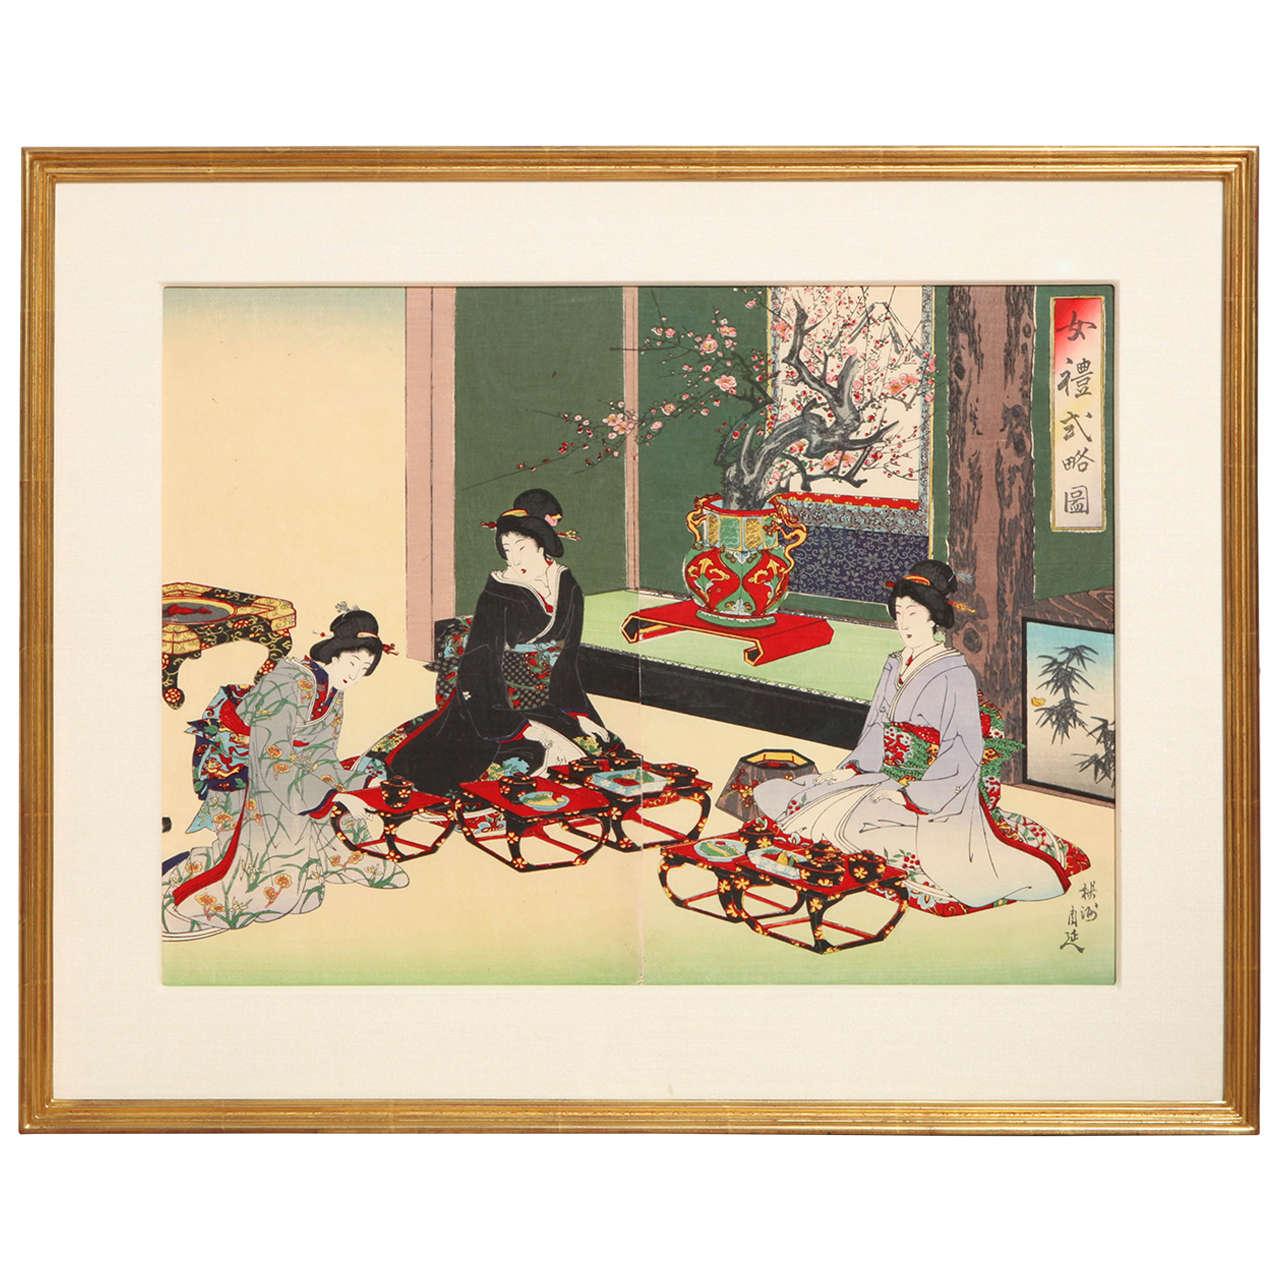 Japanese Color Woodblock Print by Toyohara Chikanobu